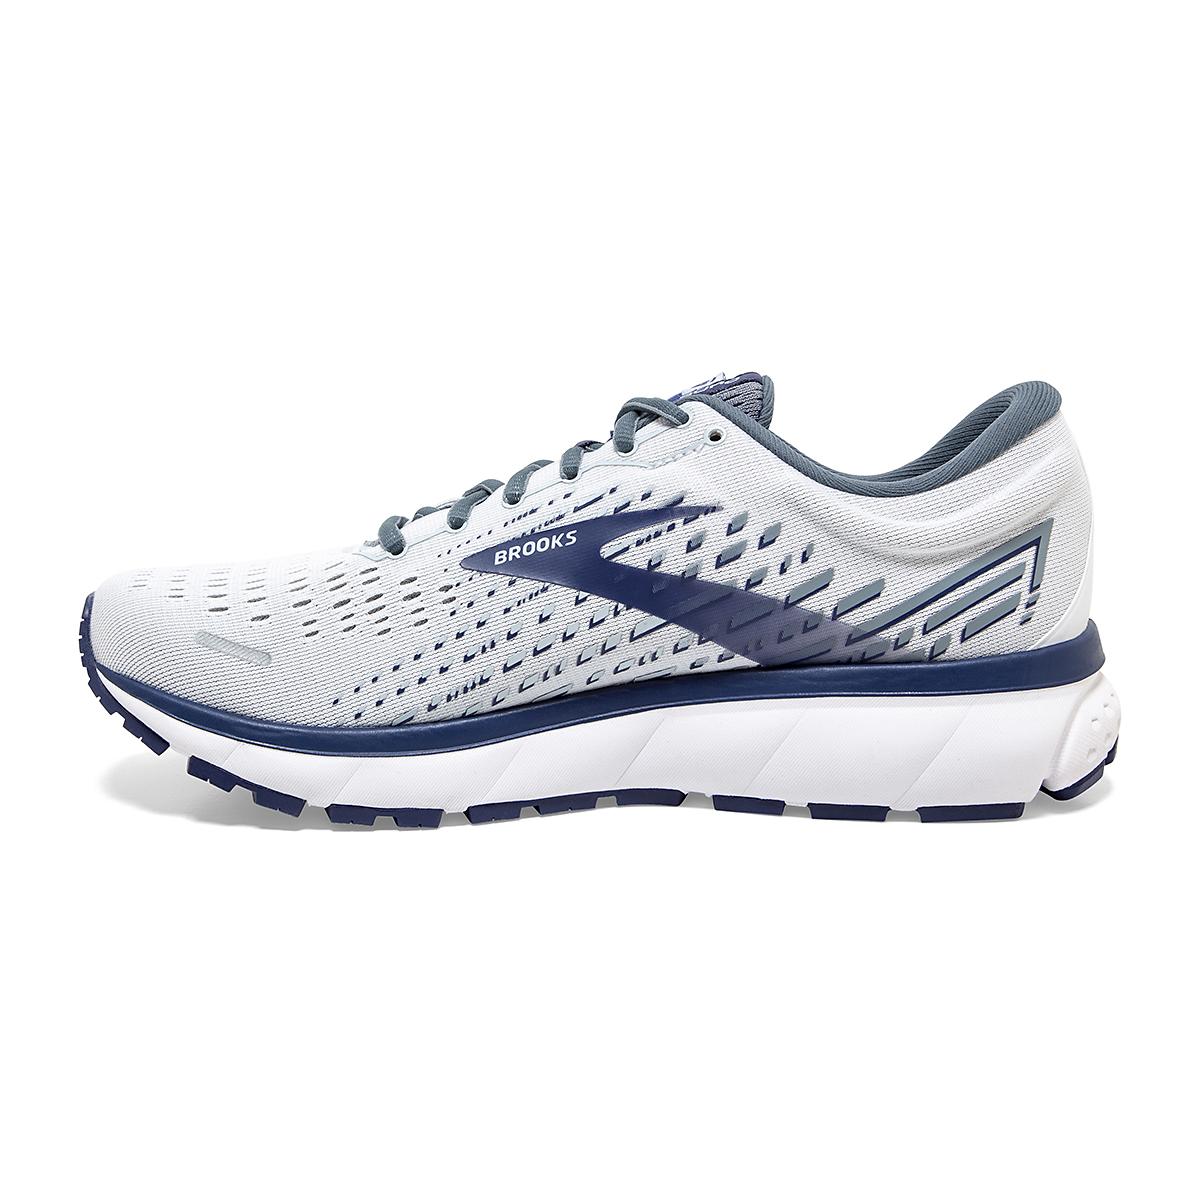 Men's Brooks Ghost 13 Running Shoe - Color: White/Grey/Deep Blue - Size: 7 - Width: Regular, White/Grey/Deep Blue, large, image 2